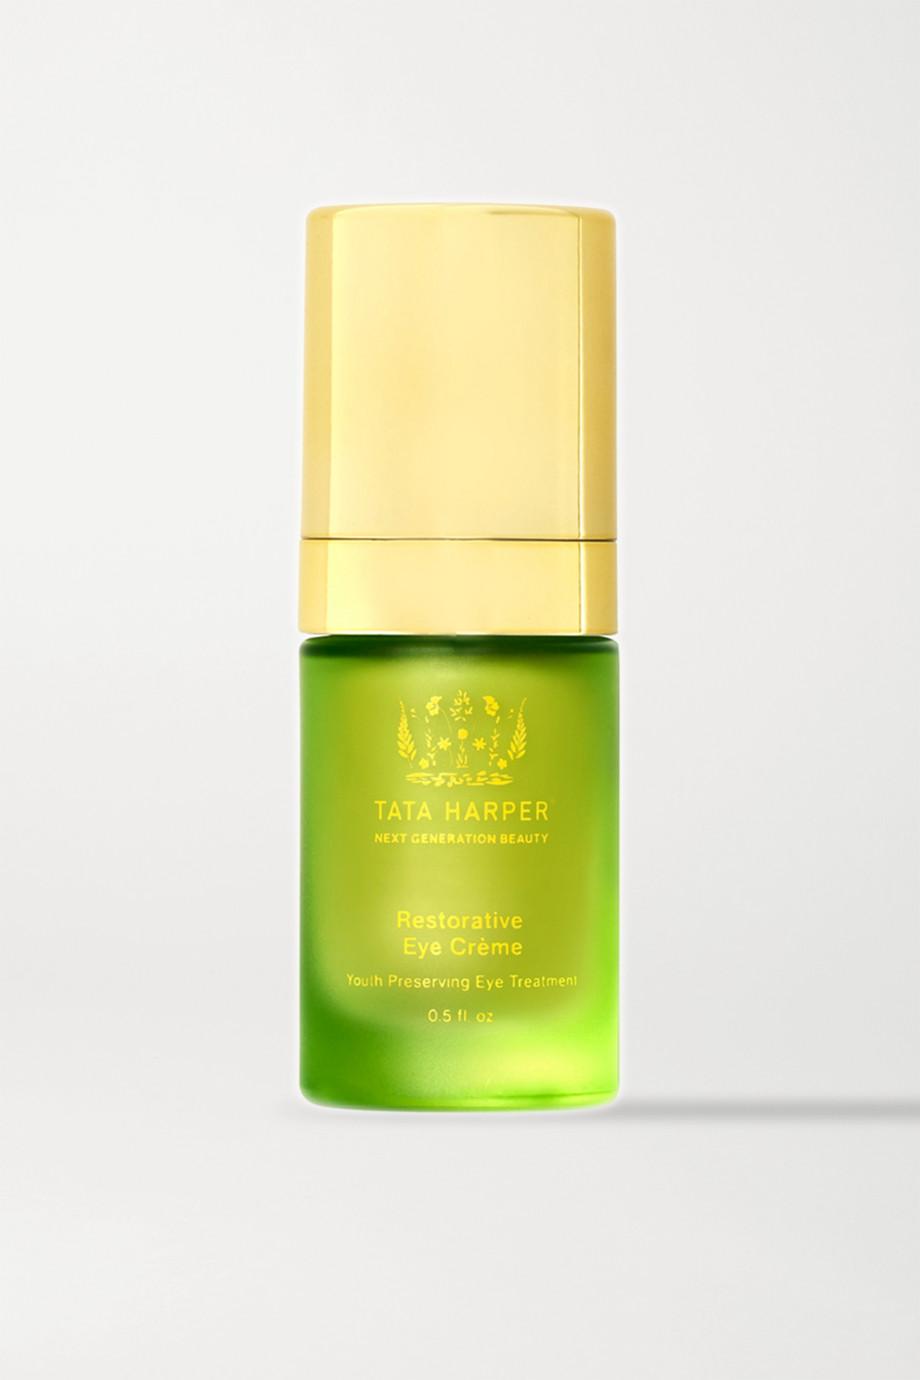 Tata Harper Restorative Eye Crème, 15ml